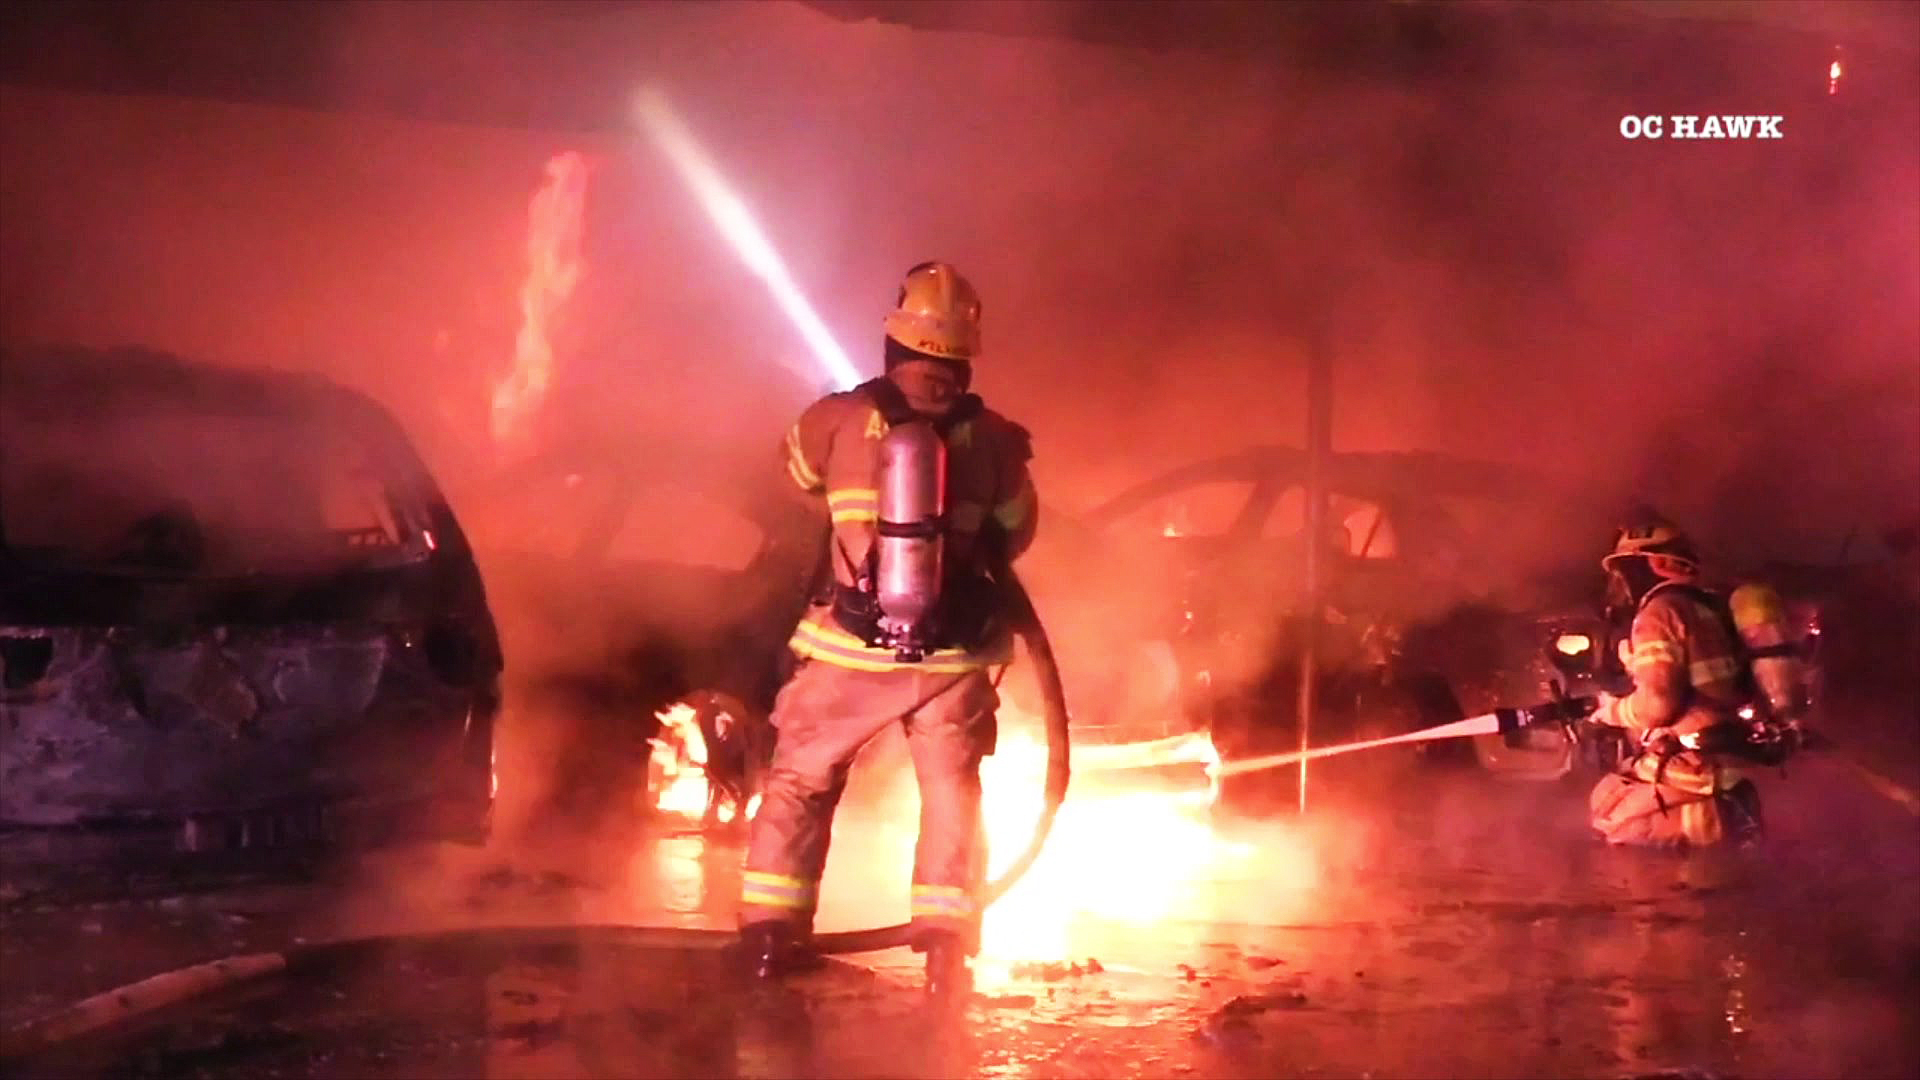 A firefighter battles a blaze in Anaheim on Jan. 31, 2019. (Credit: OC Hawk)